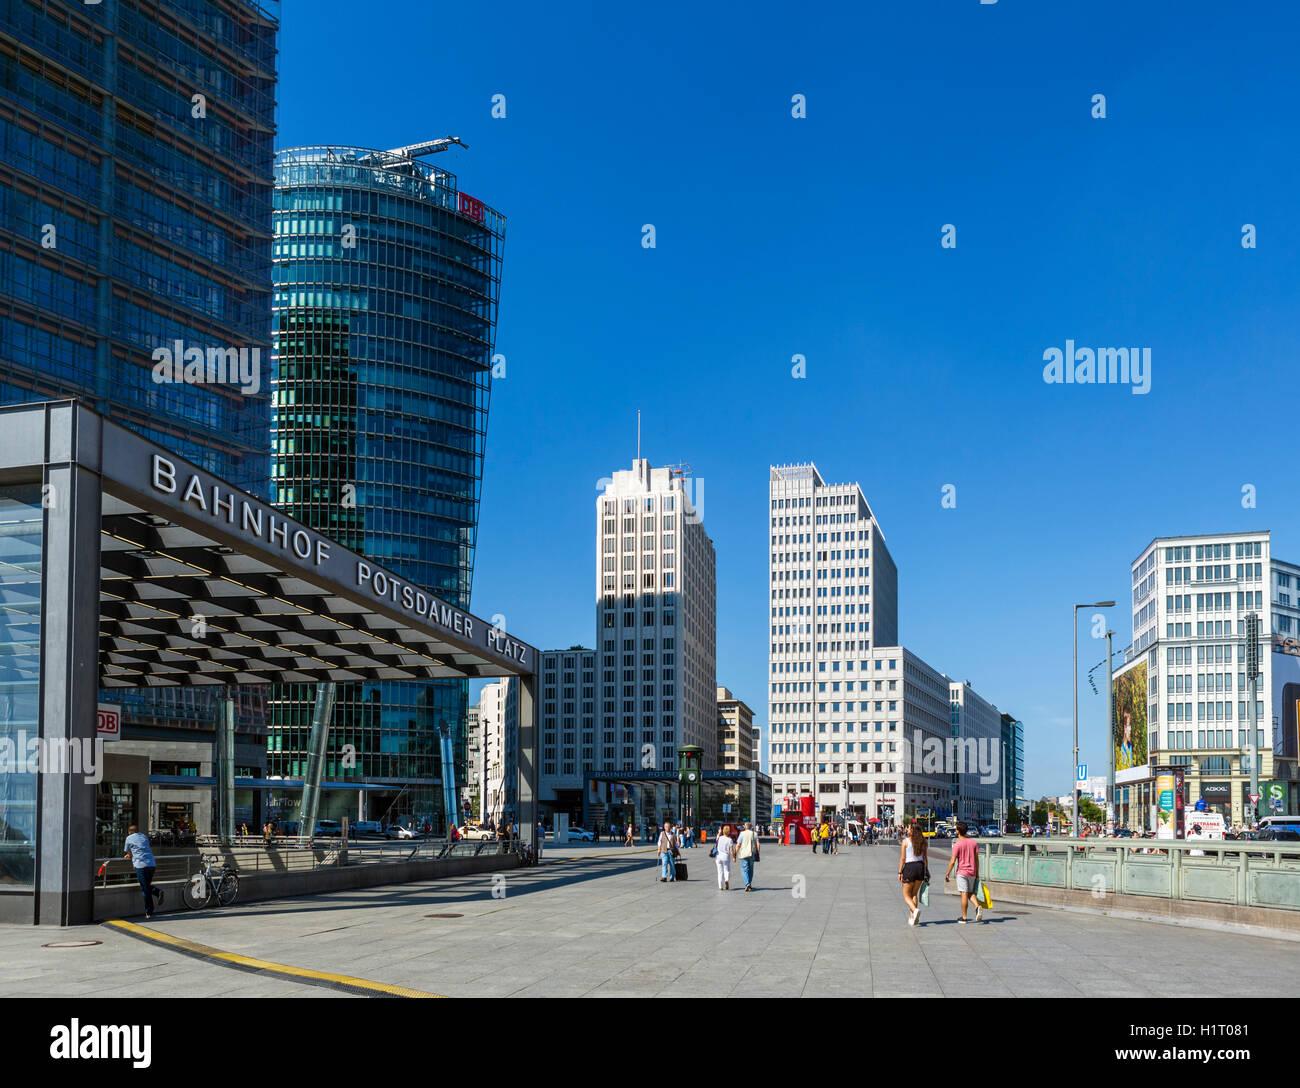 Potsdamer Platz, Berlin, Deutschland Stockbild